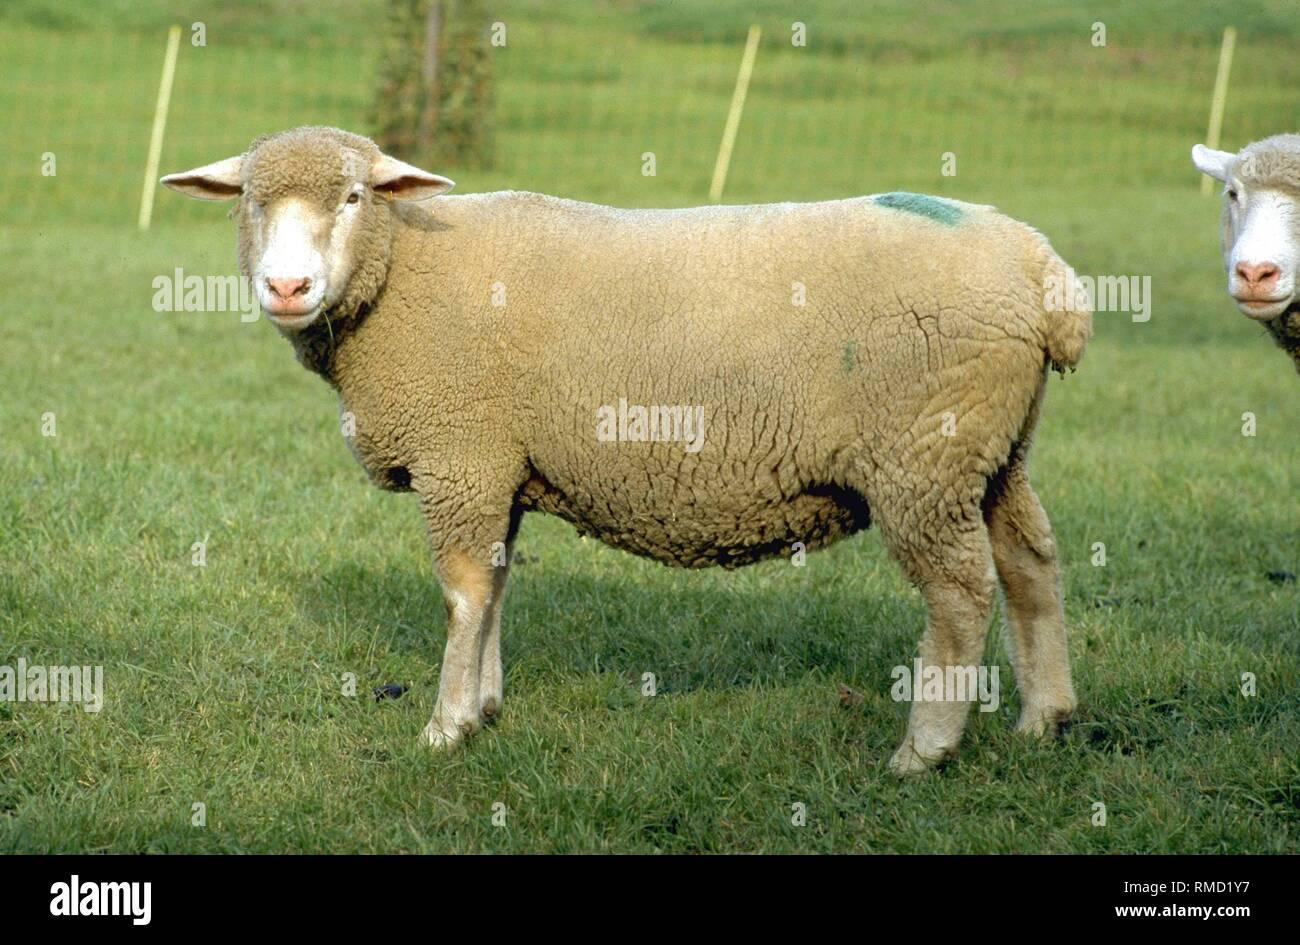 Merino Meat Sheep Stock Photos & Merino Meat Sheep Stock